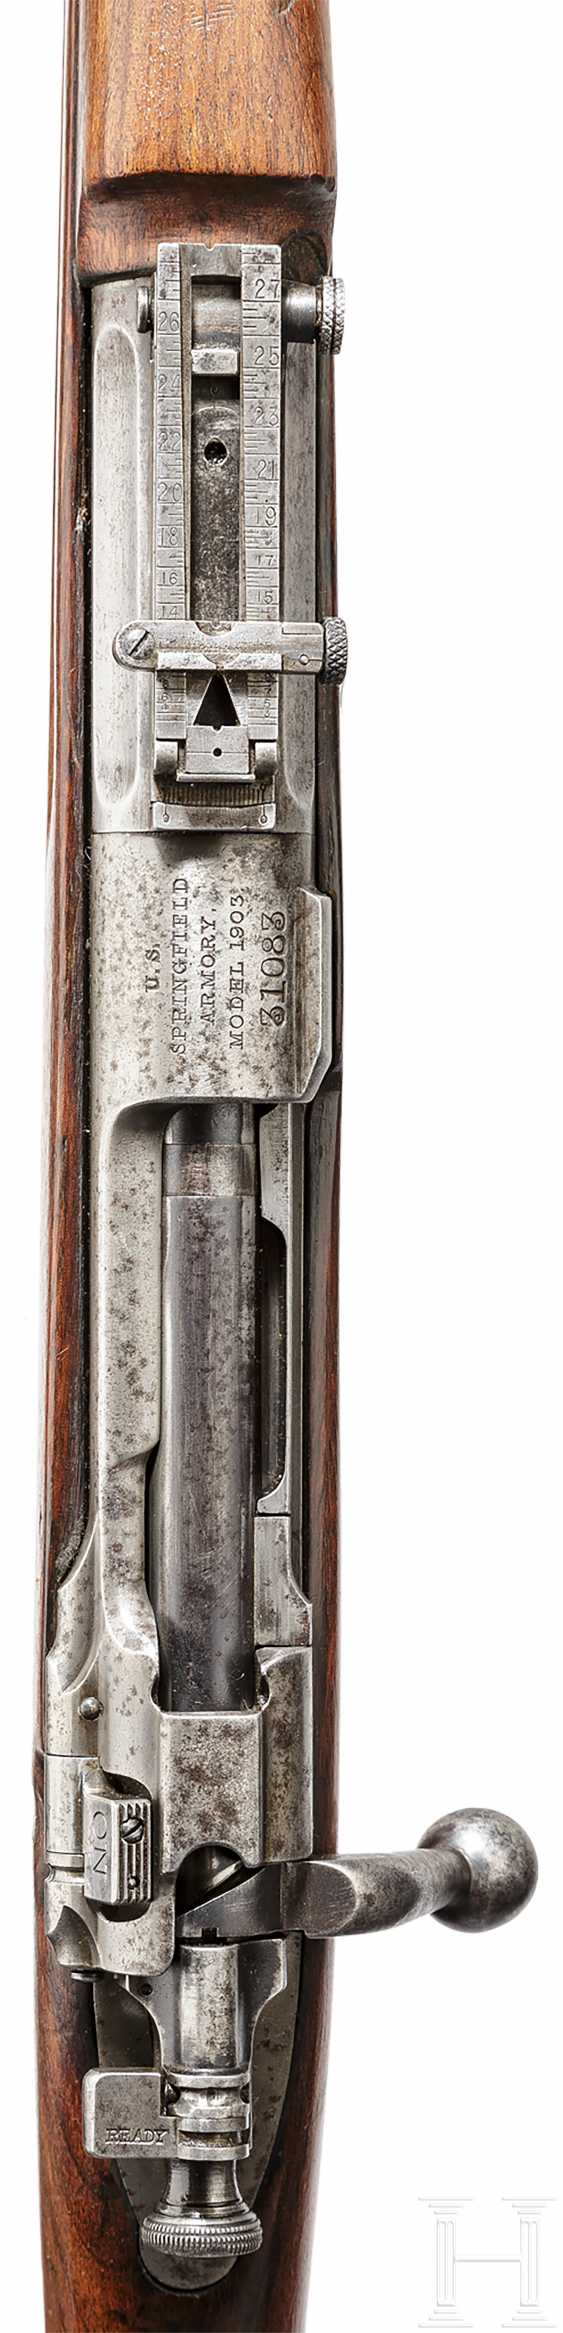 Springfield Modell 1903 - photo 3